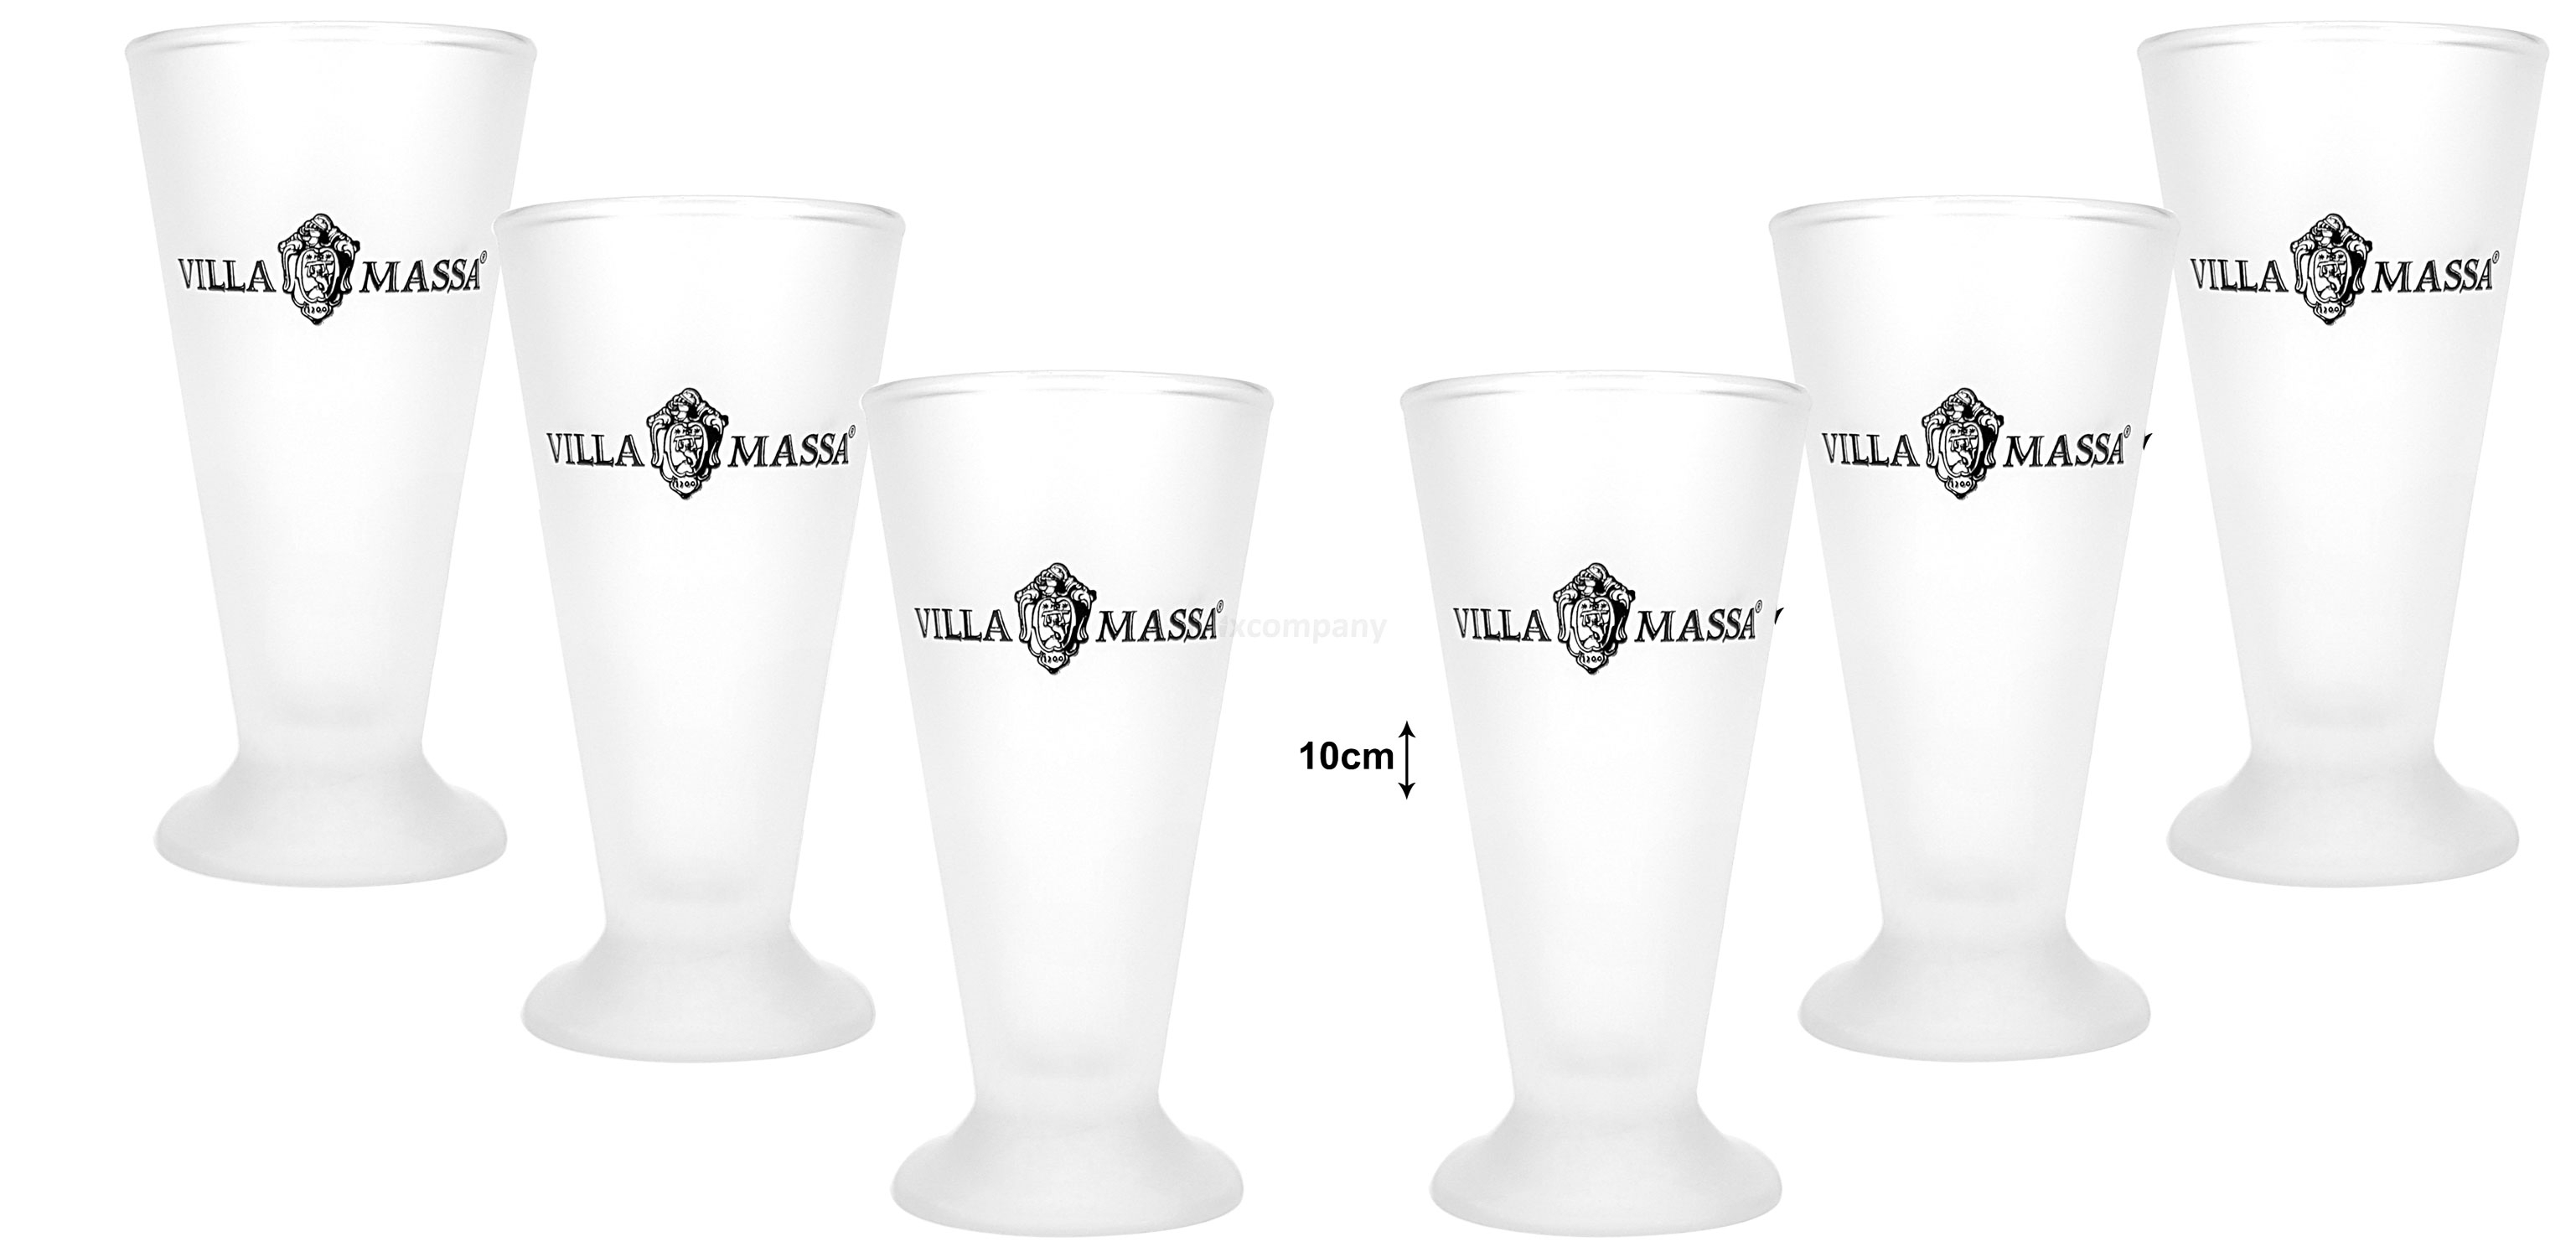 Villa Massa Shotglas Glas Gläser Set - 6x Gläser Milchglas weiß